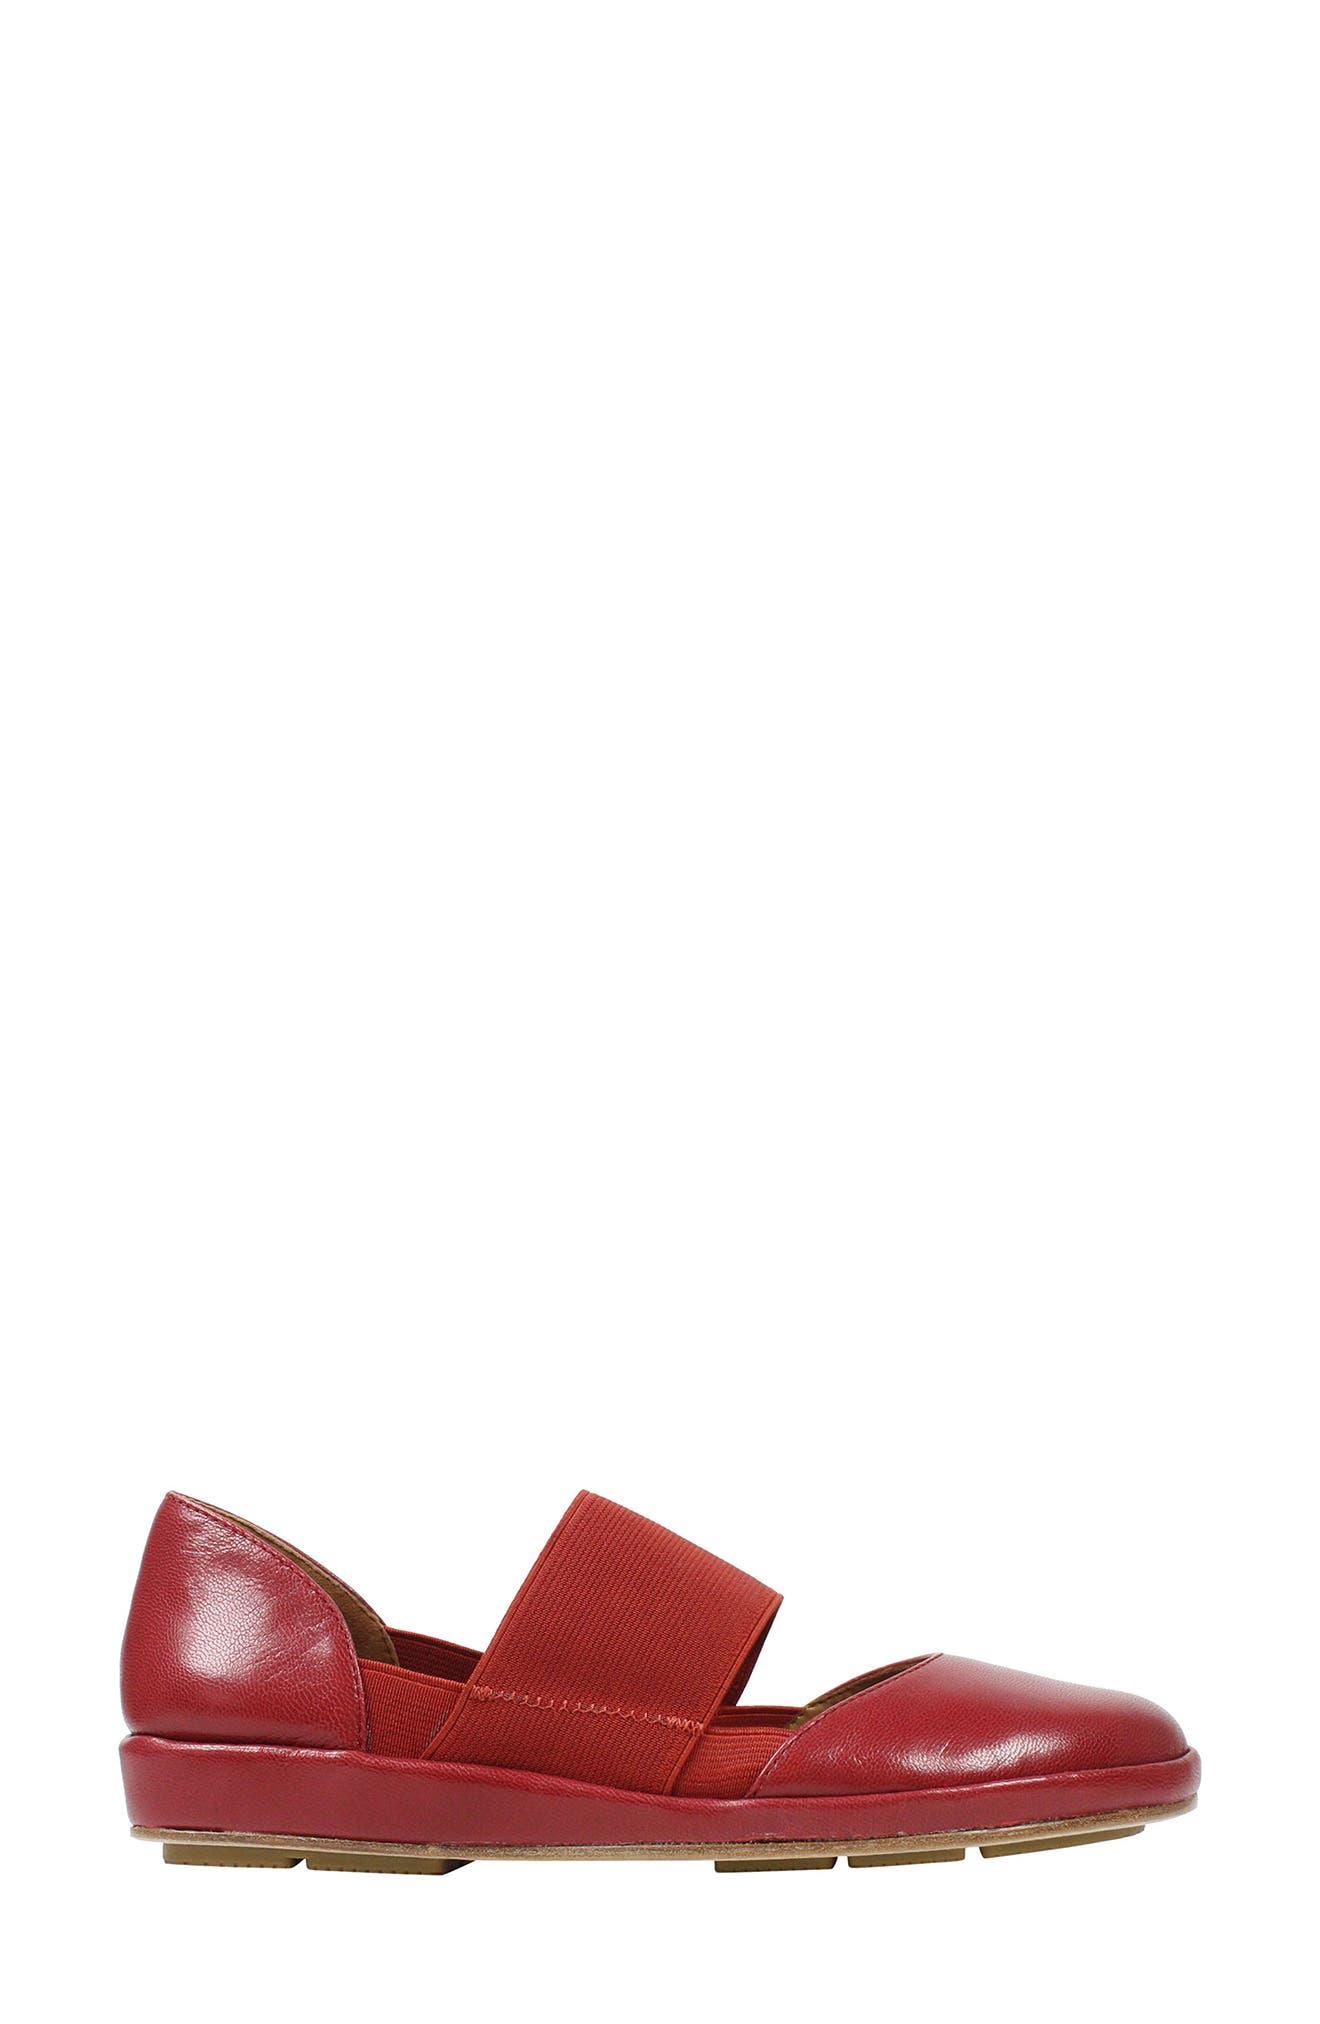 Camile Wedge Pump,                             Alternate thumbnail 3, color,                             Claret Leather